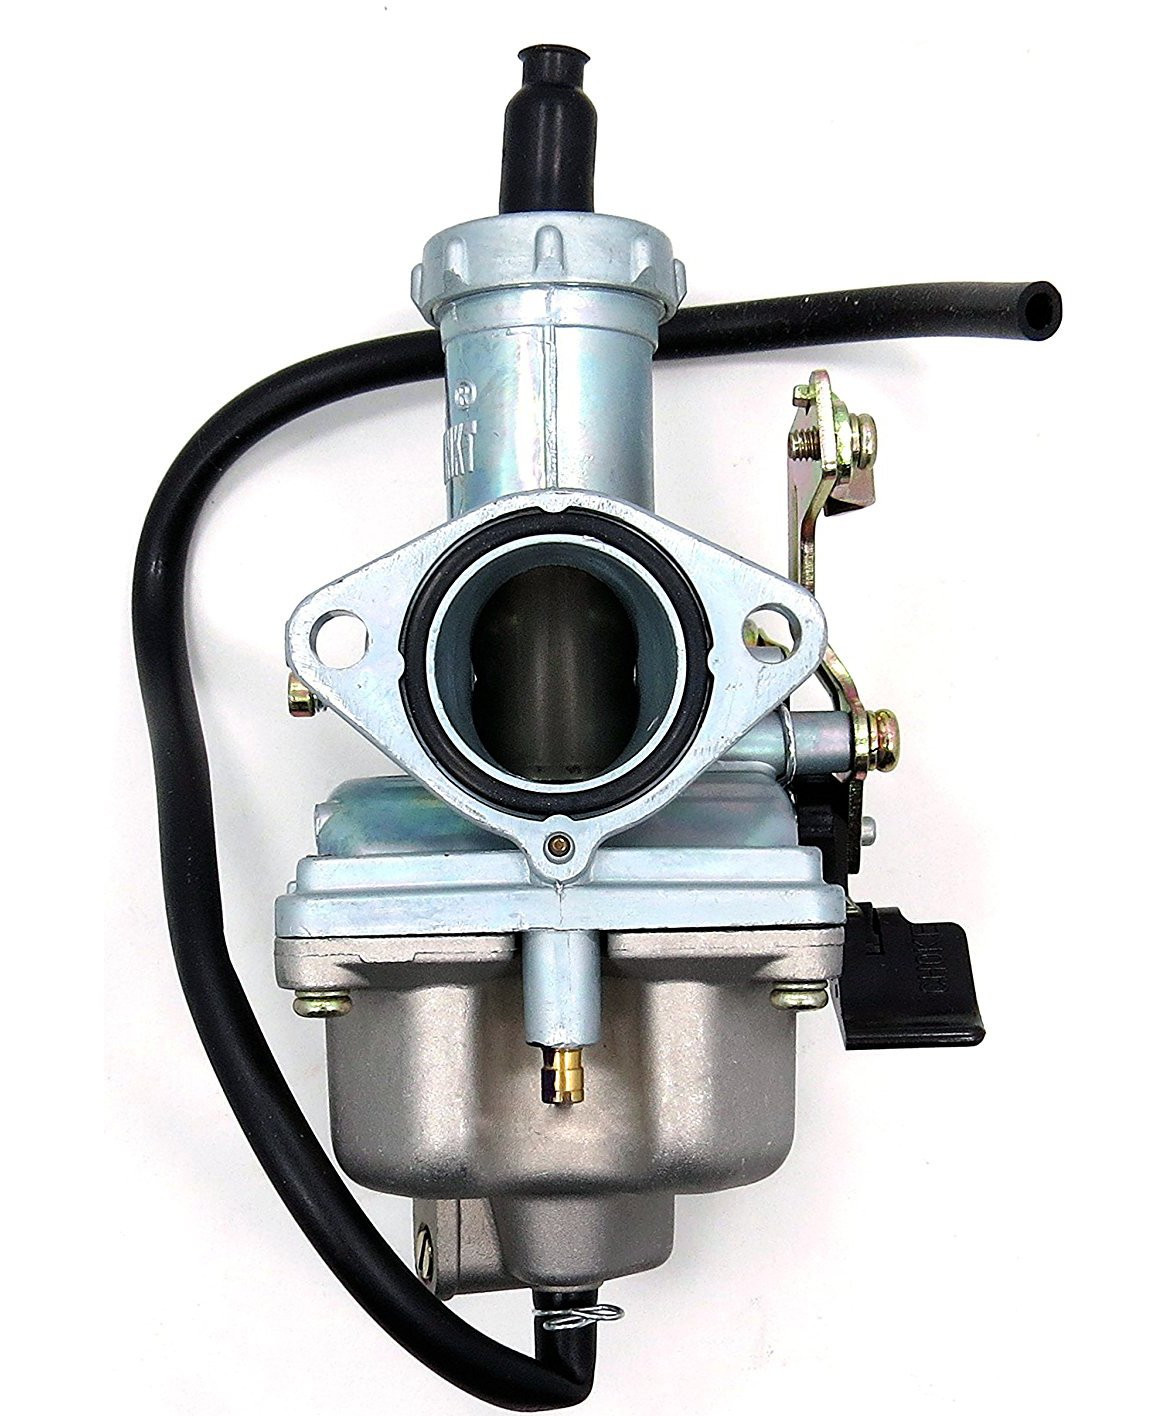 Auto Moto Carburetor Pz 27mm For 125 150 200 250 300cc Honda Rancher 400 Fuel Filter Atv Go Karts Carb Chinese Sunl Automotive